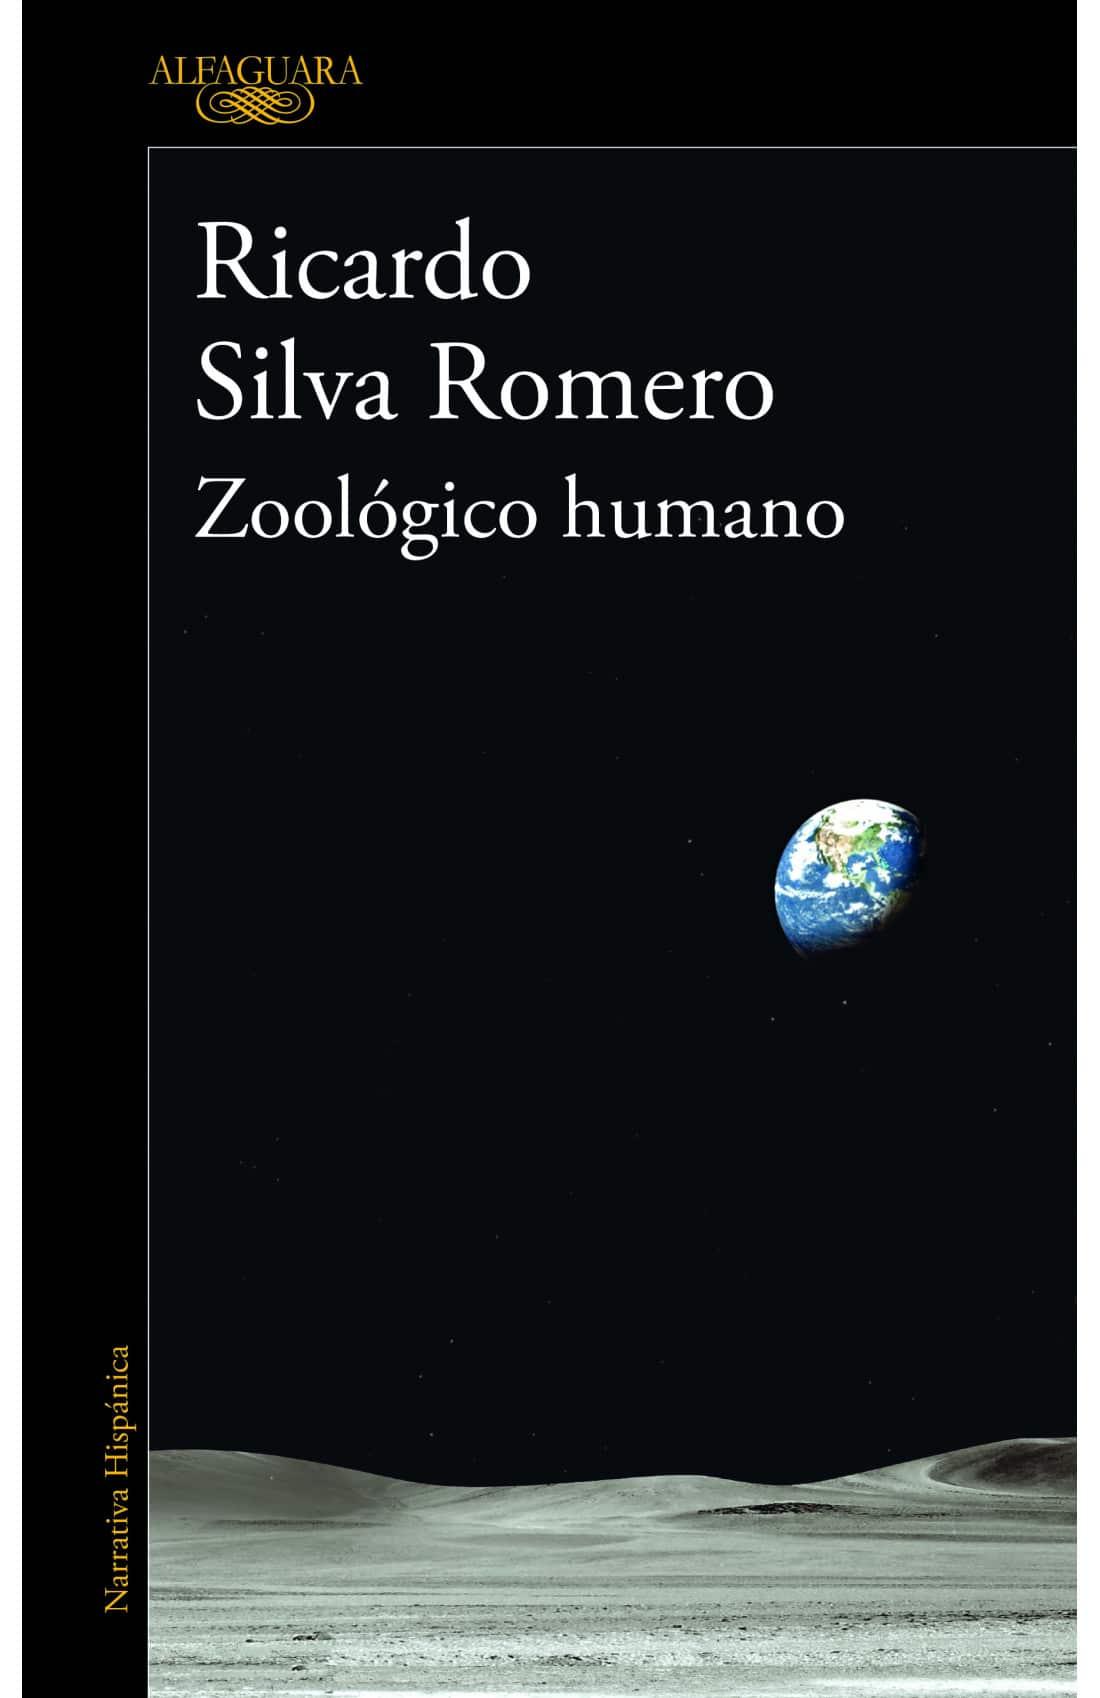 2.-Zoológico-humano-Ricardo-Silva-Romero-Alfaguara-